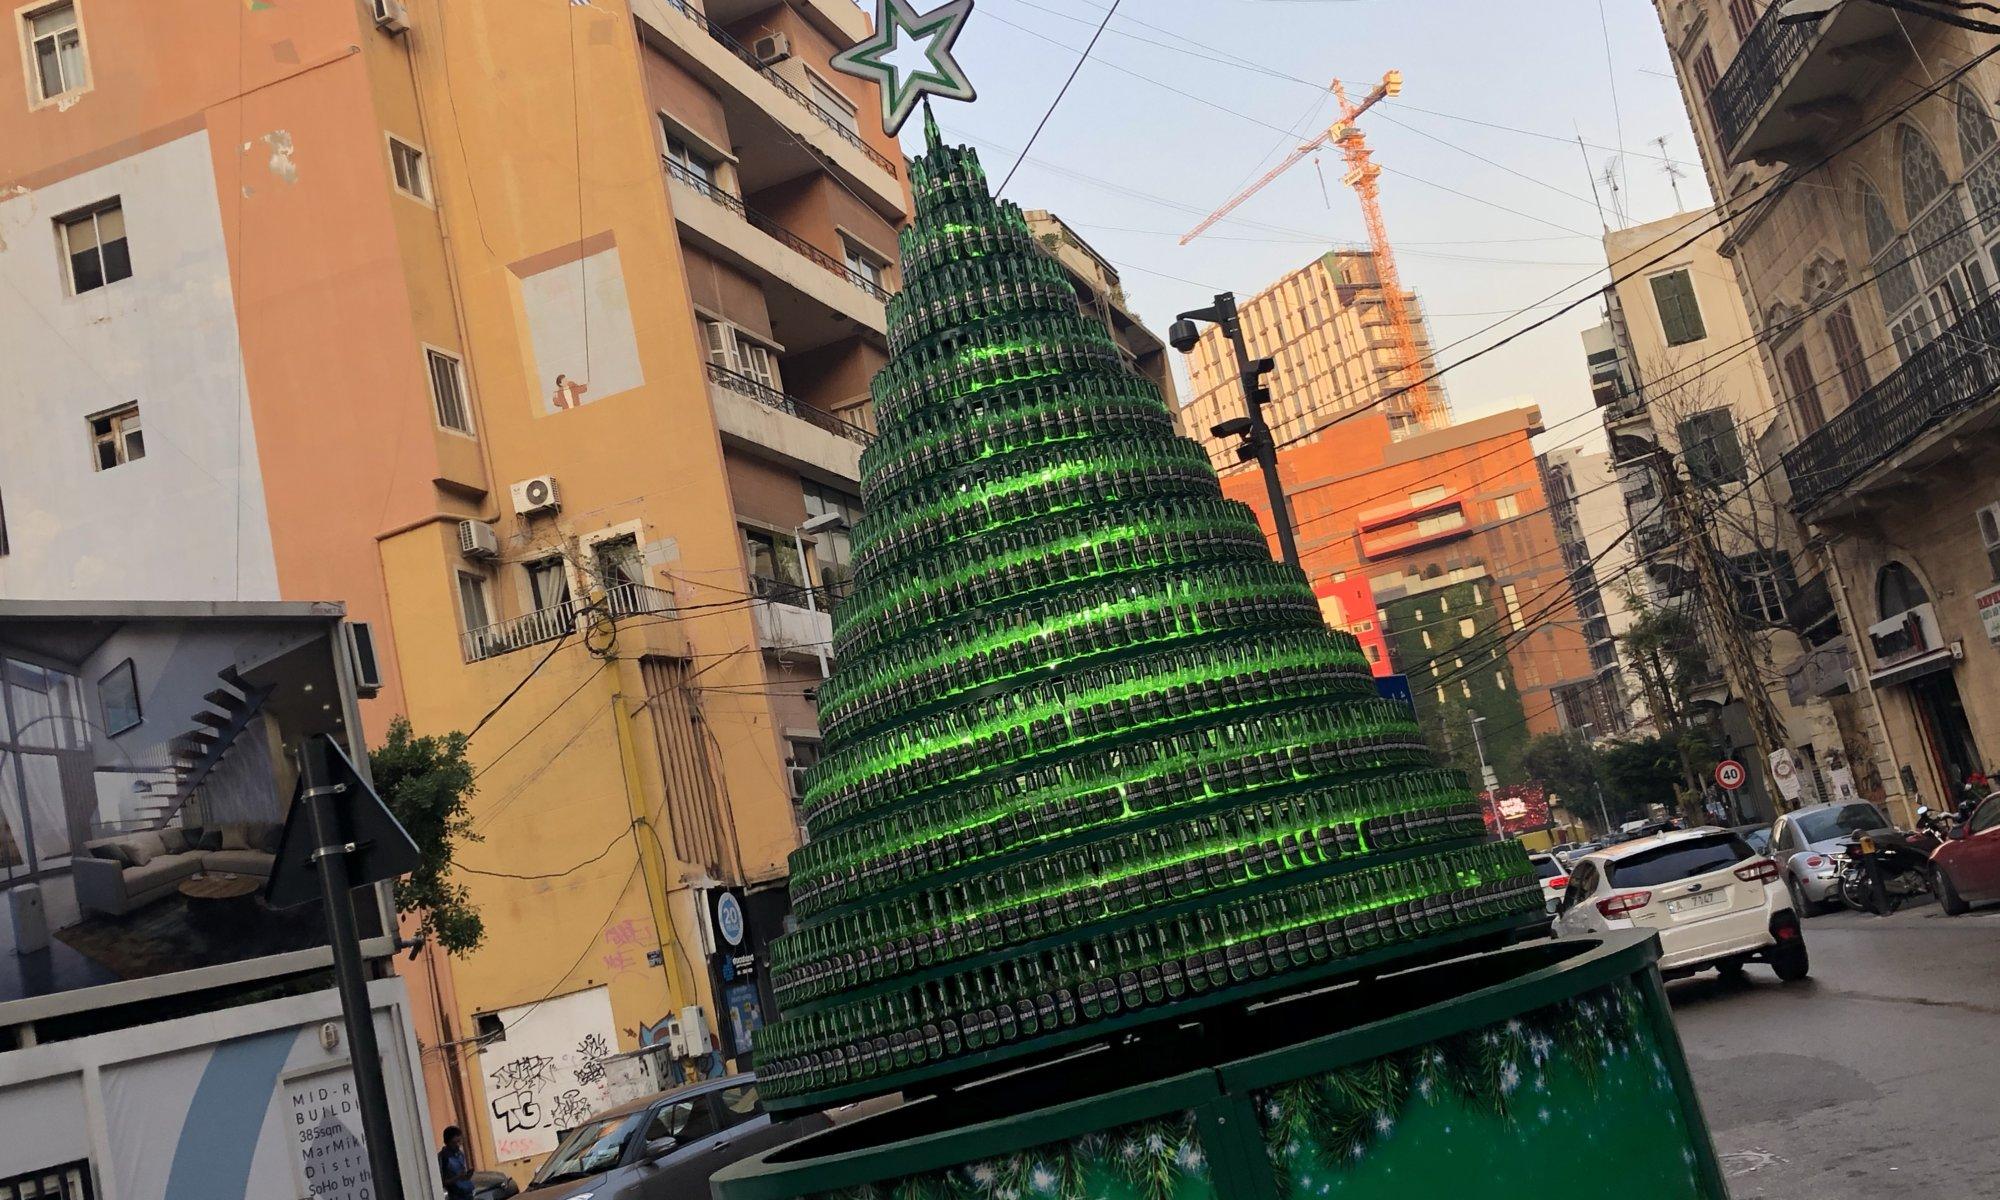 Beer Christmas tree, Armenian quarter, بيروت